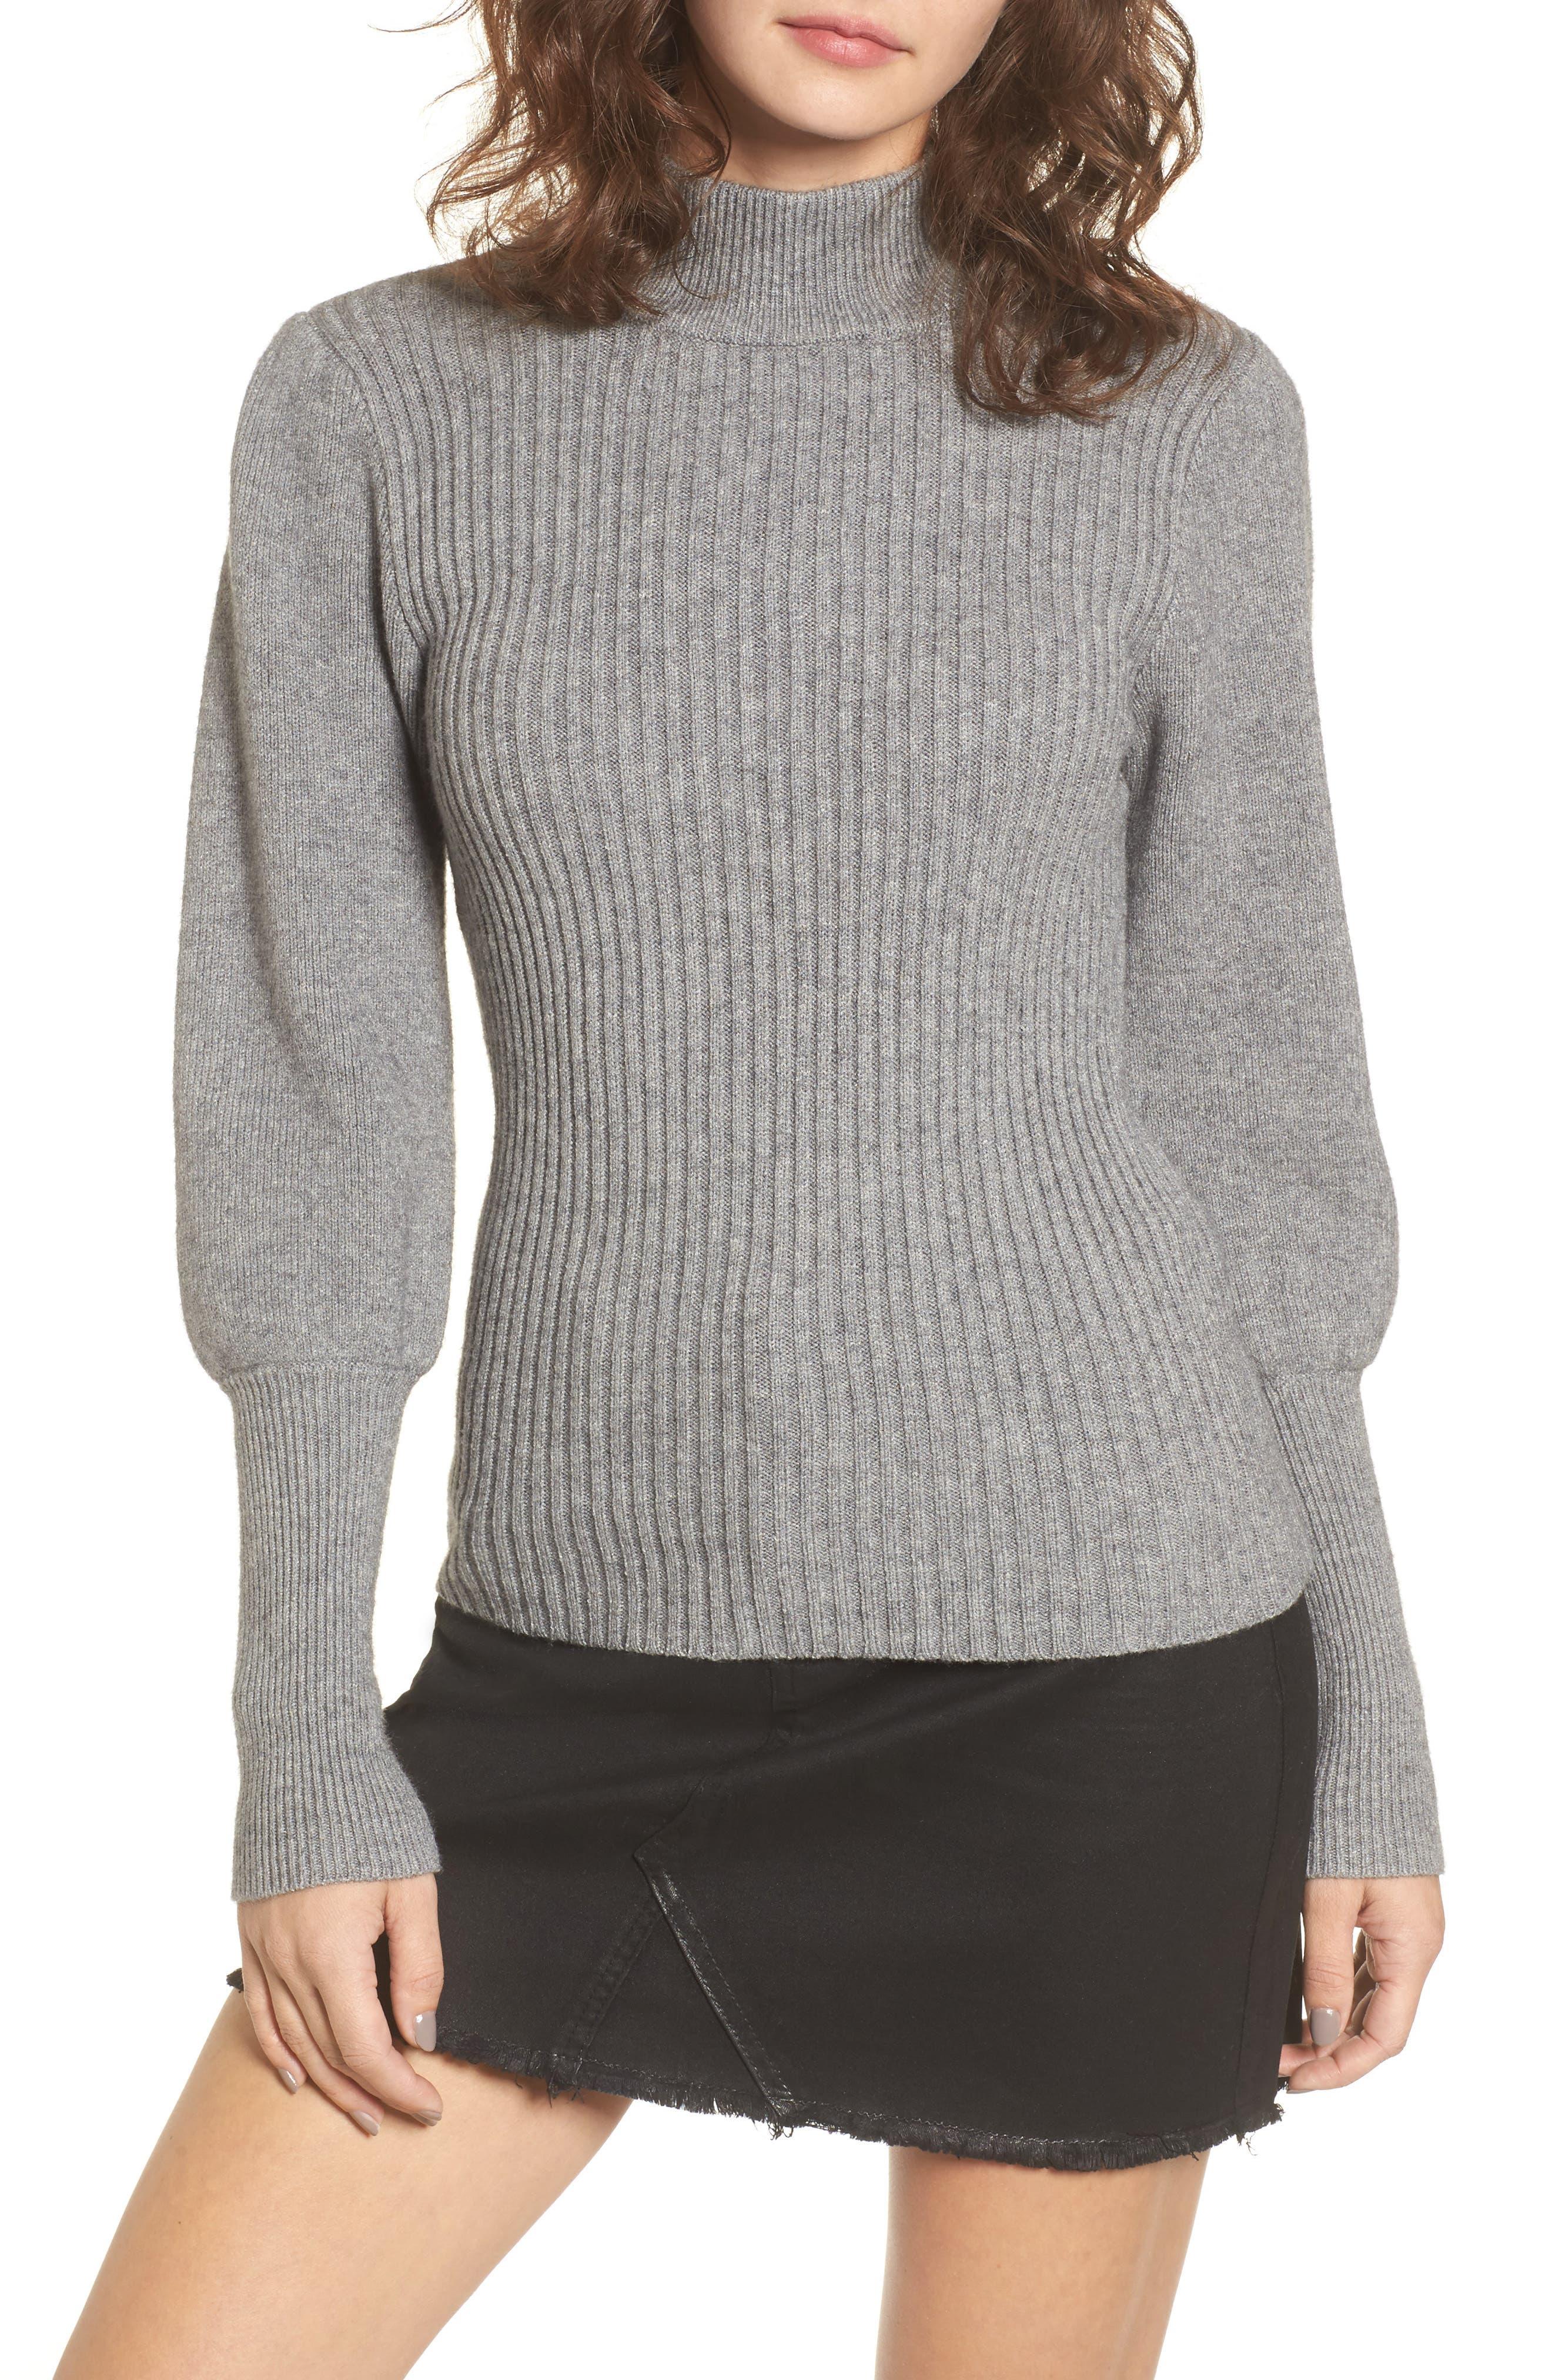 Main Image - MOON RIVER Puff Sleeve Sweater